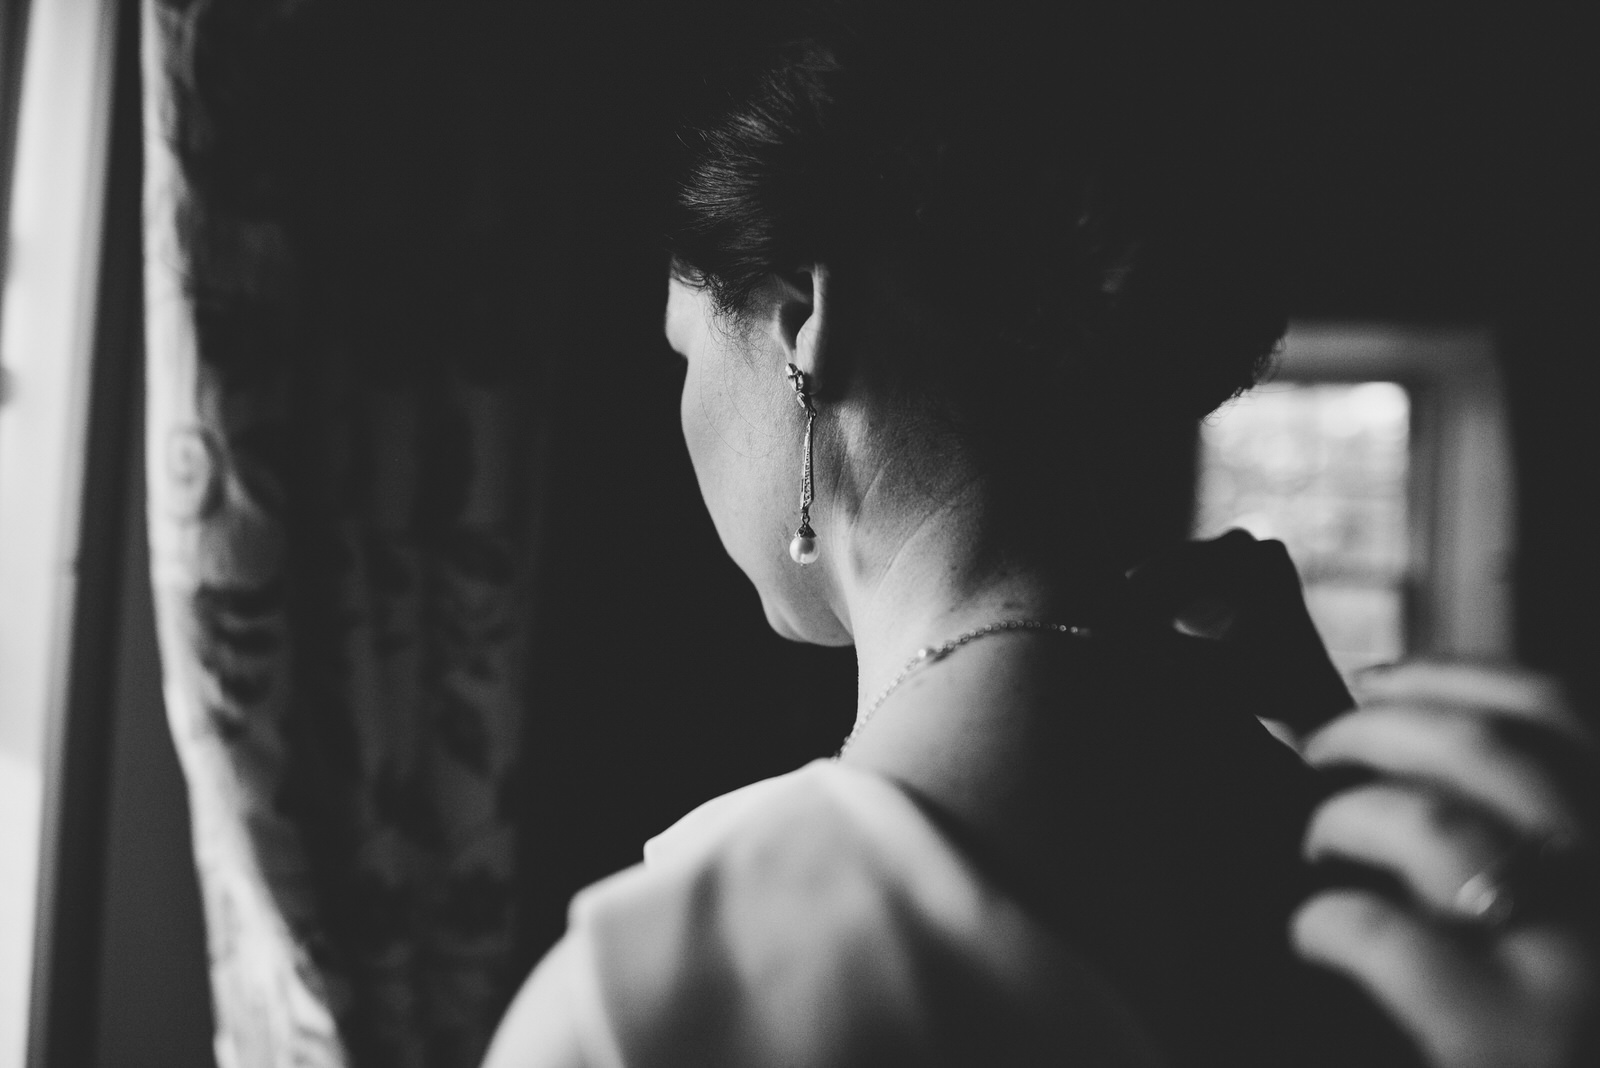 011-COLSTOUN-HOUSE-WEDDING-ALTERNATIVE-WEDDING-PHOTOGRAPHER-GLASGOW-WEDDING-PHOTOGRAPHER-STYLISH-SCOTTISH-WEDDING.JPG